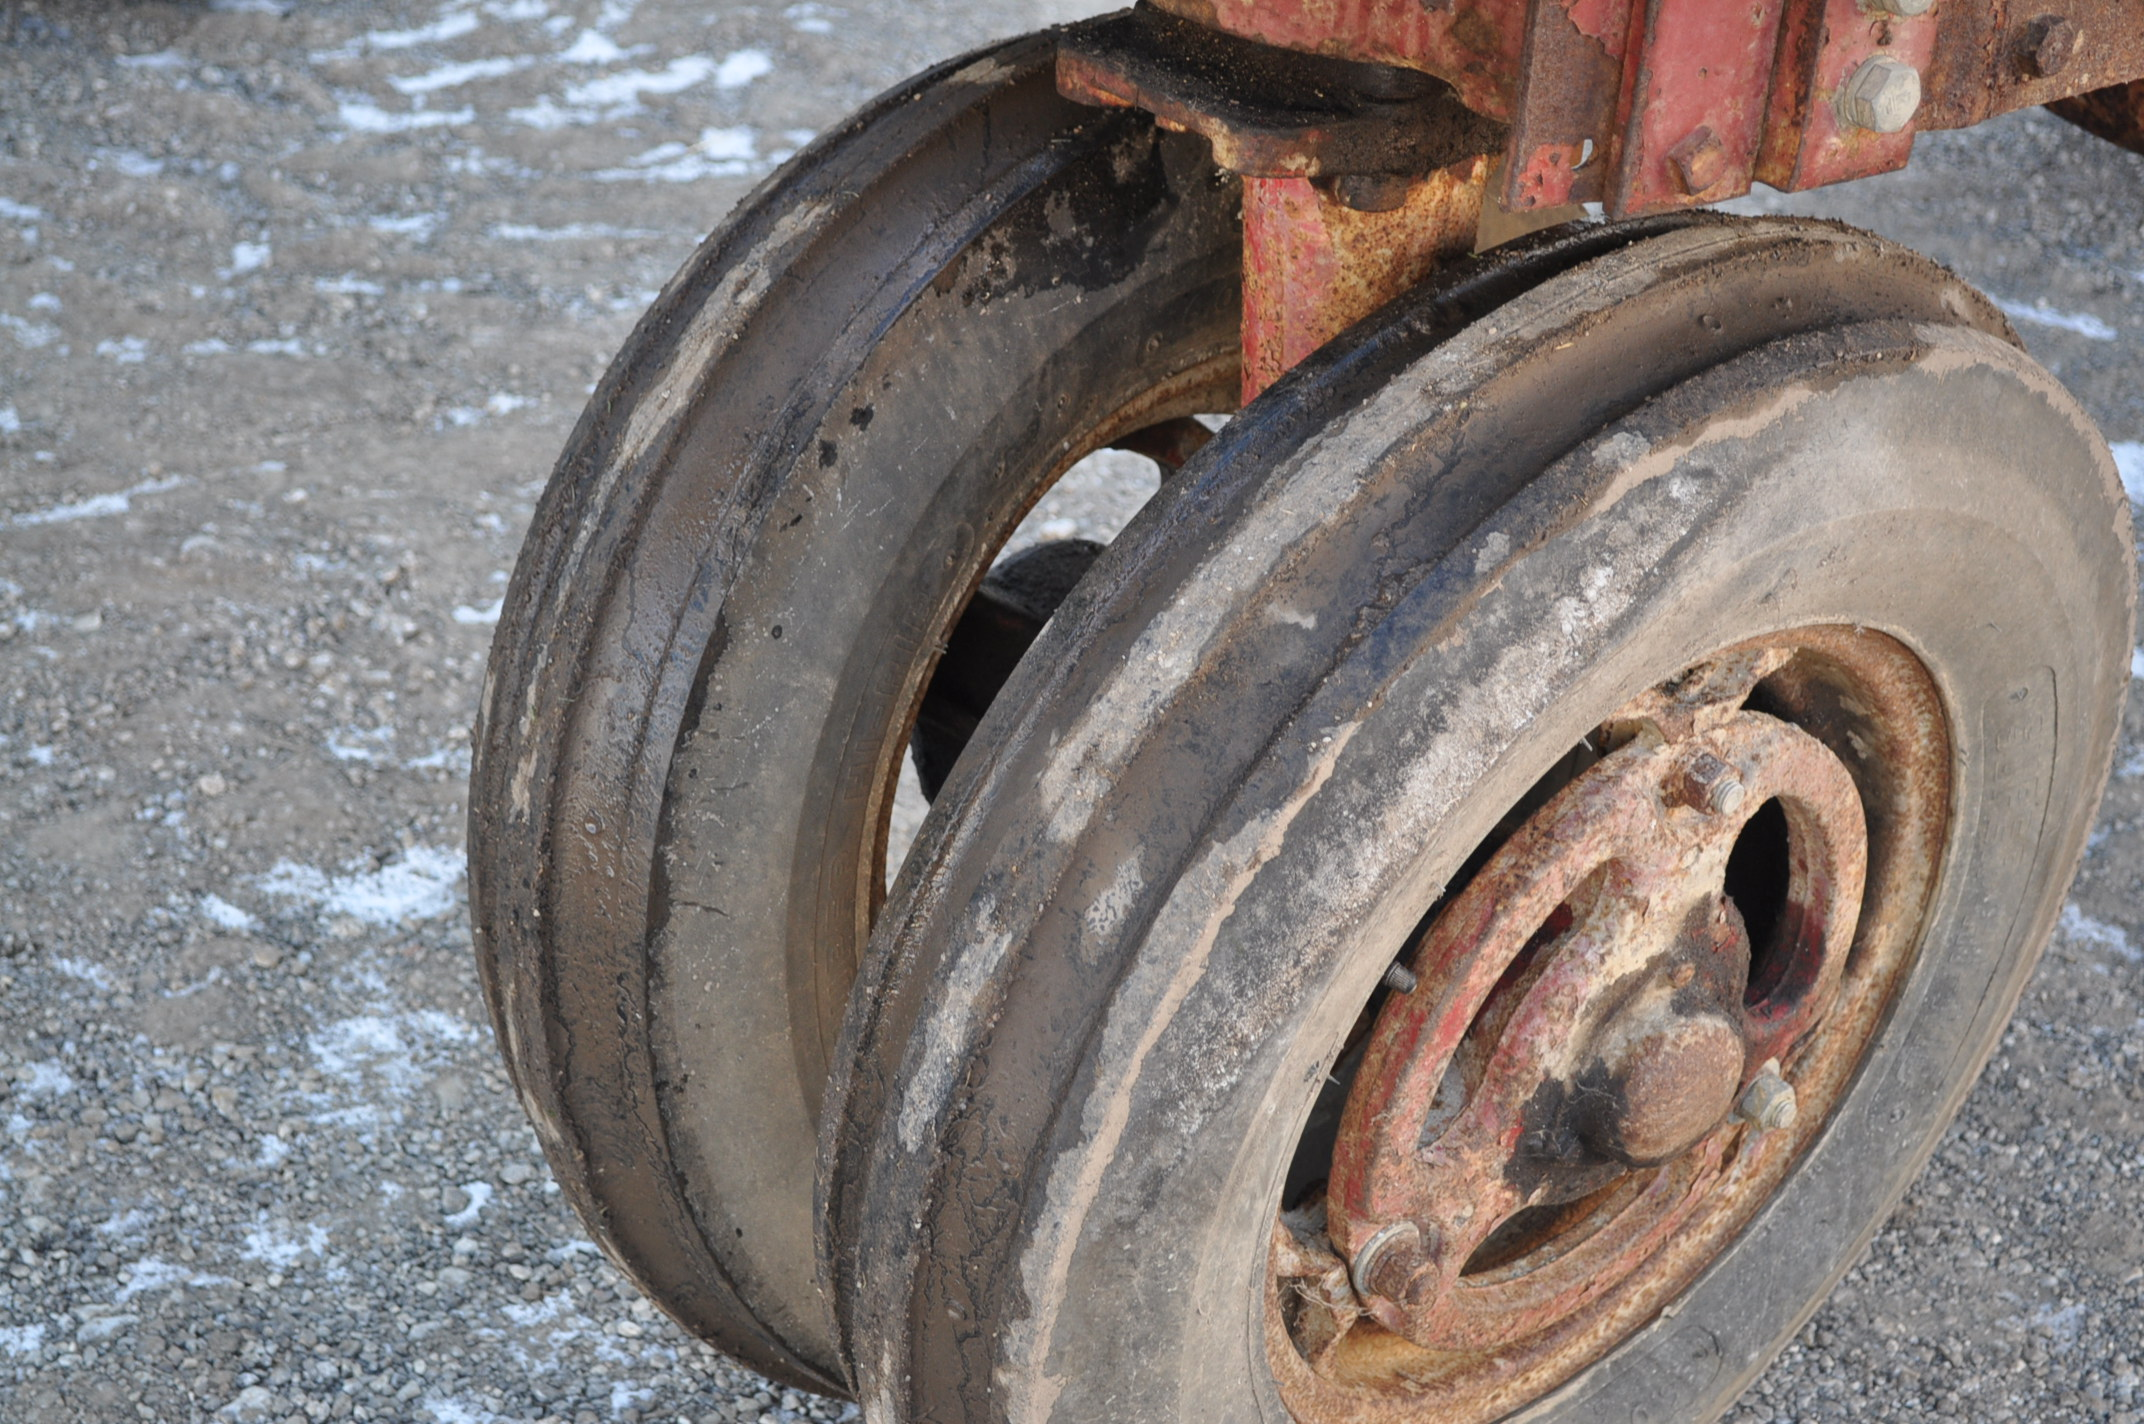 Farmall M tractor, 13.6-38 rear, narrow front, gasoline, loader, 540 PTO, SN FBK276 - Image 5 of 11